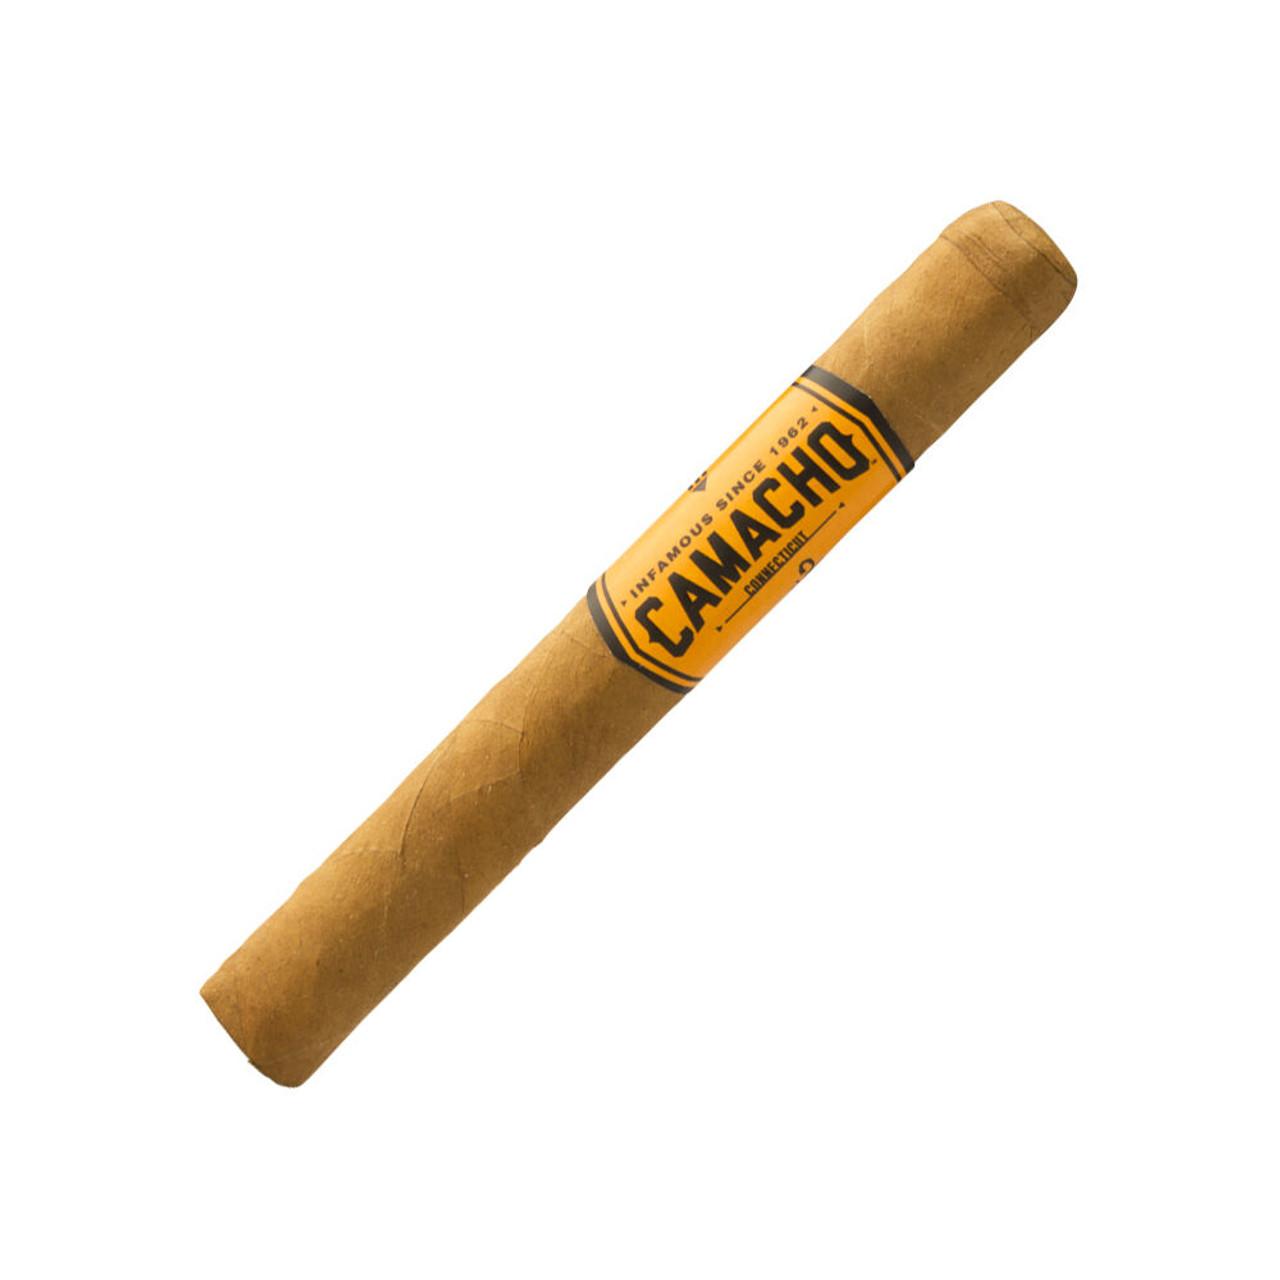 Camacho Connecticut Machitos Cigars - 4 x 32 (5 Tins of 6)